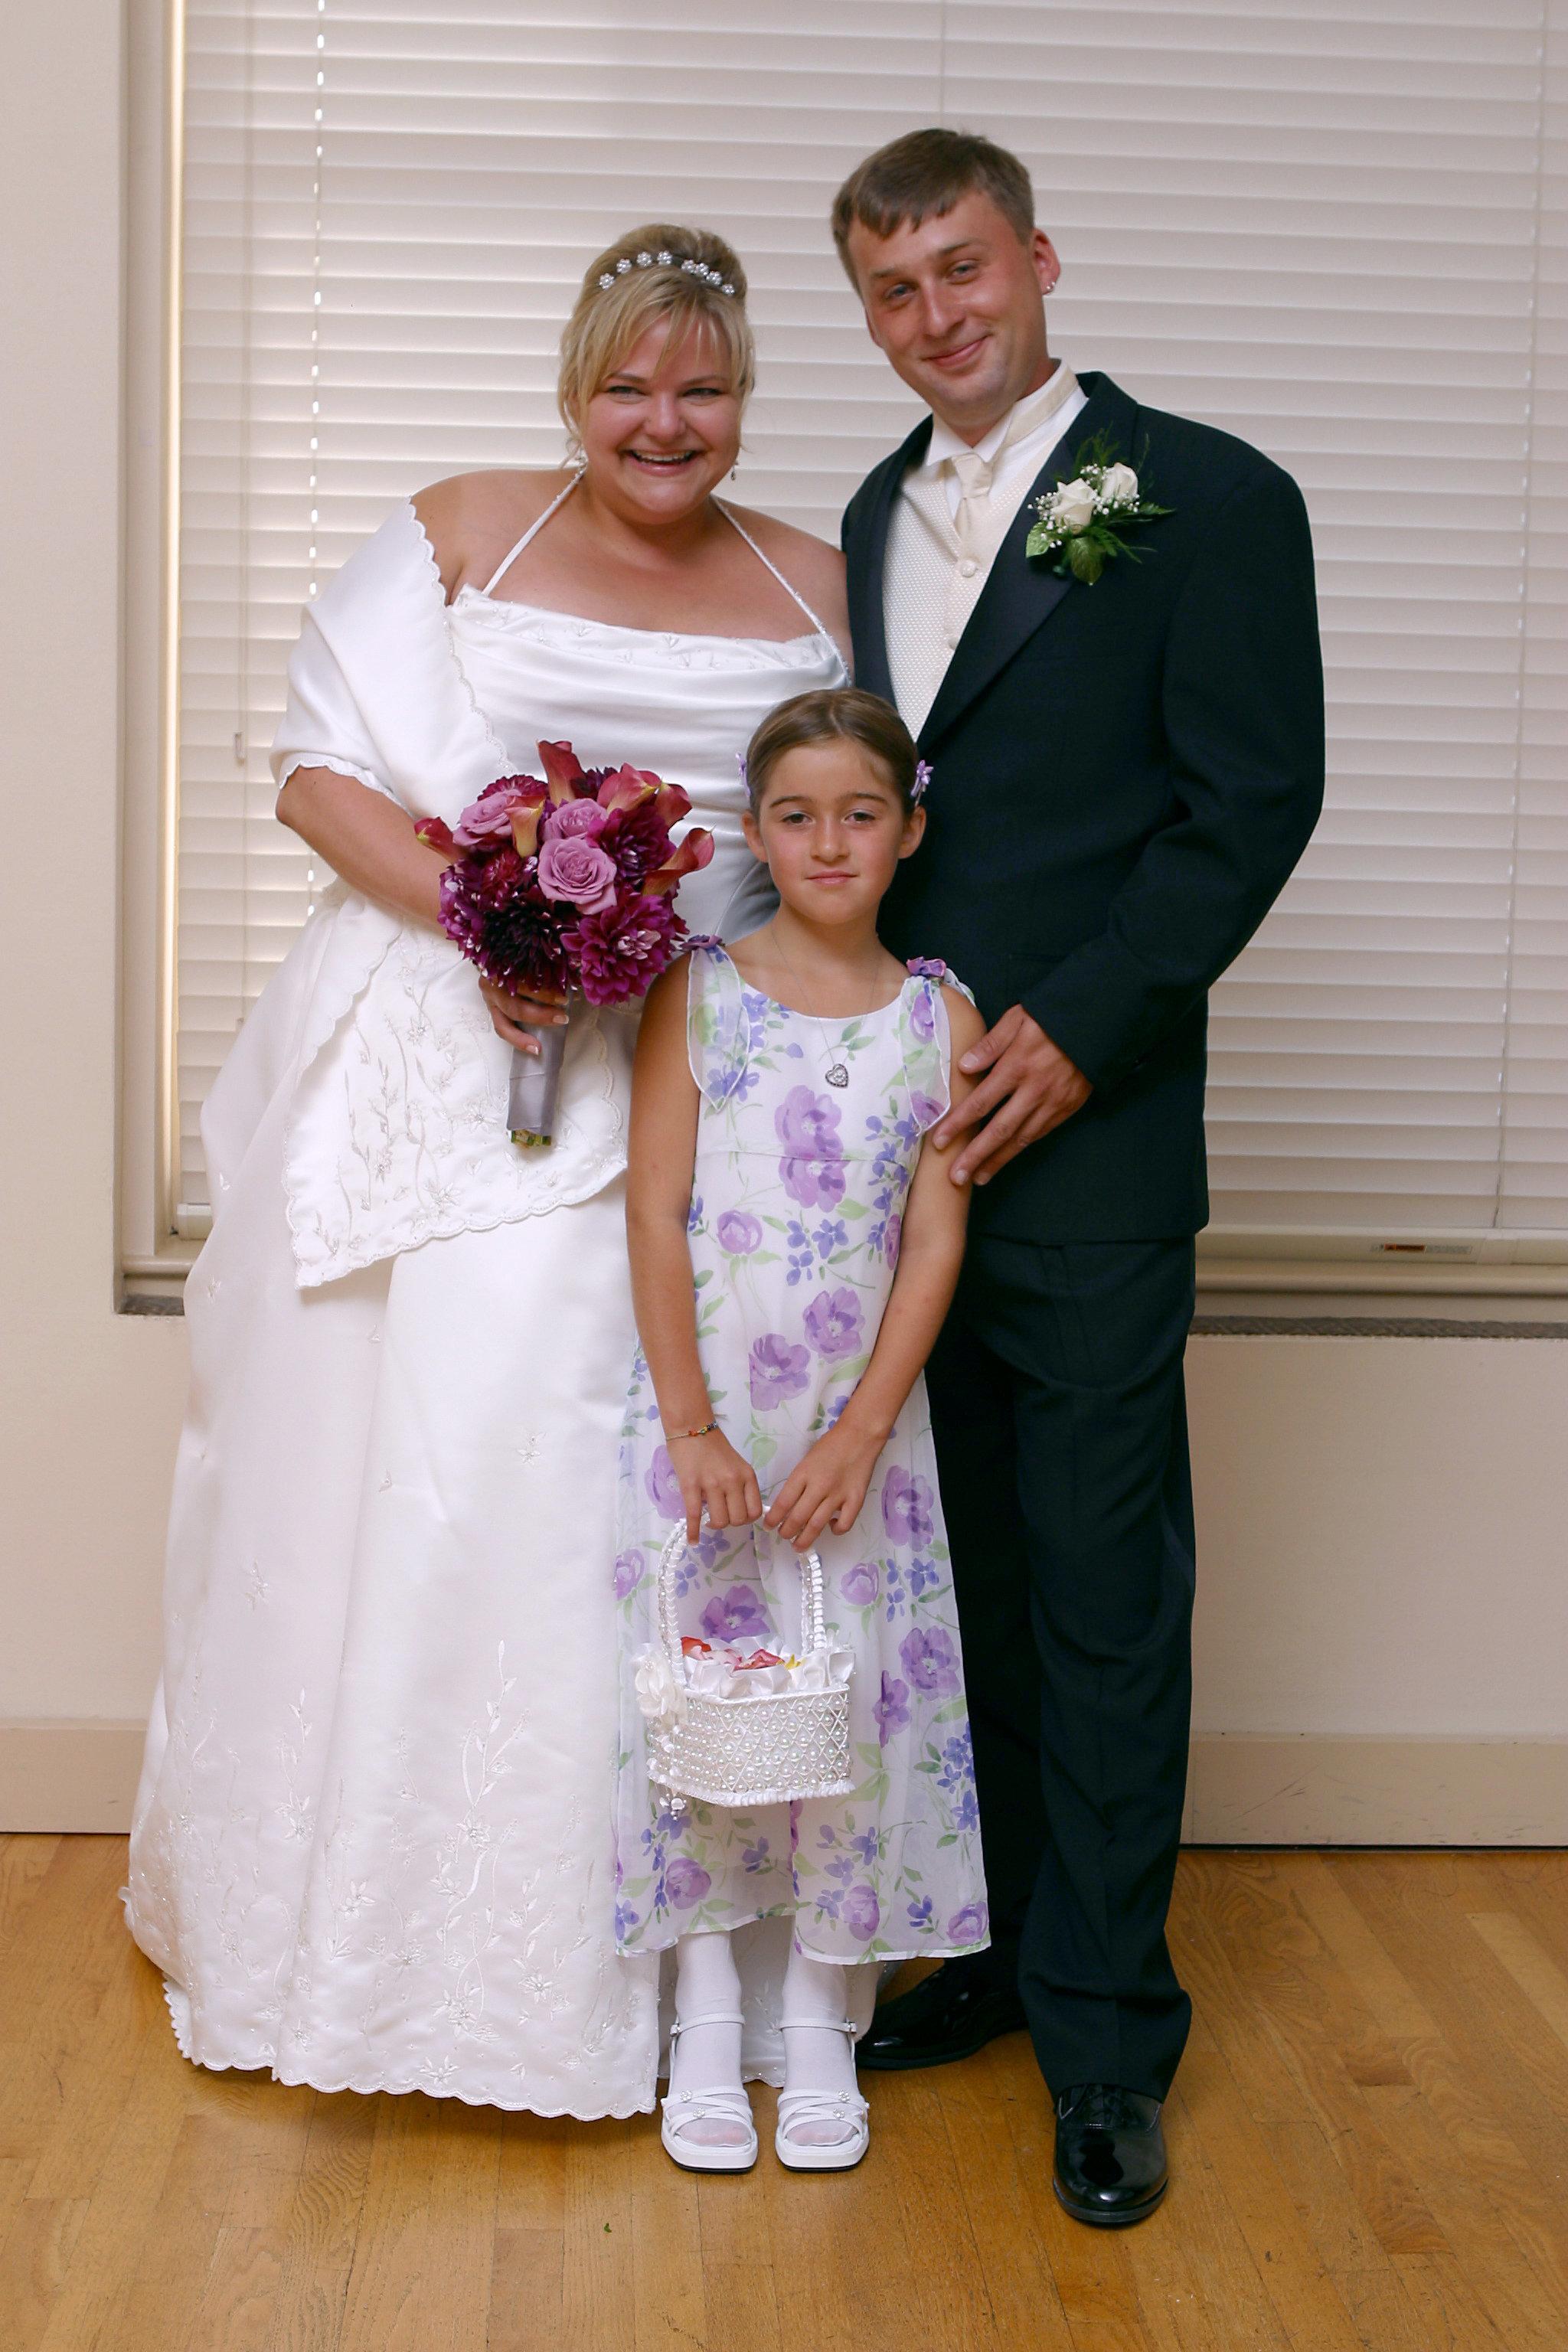 Katherine and Bryan's wedding, July 26, 2003